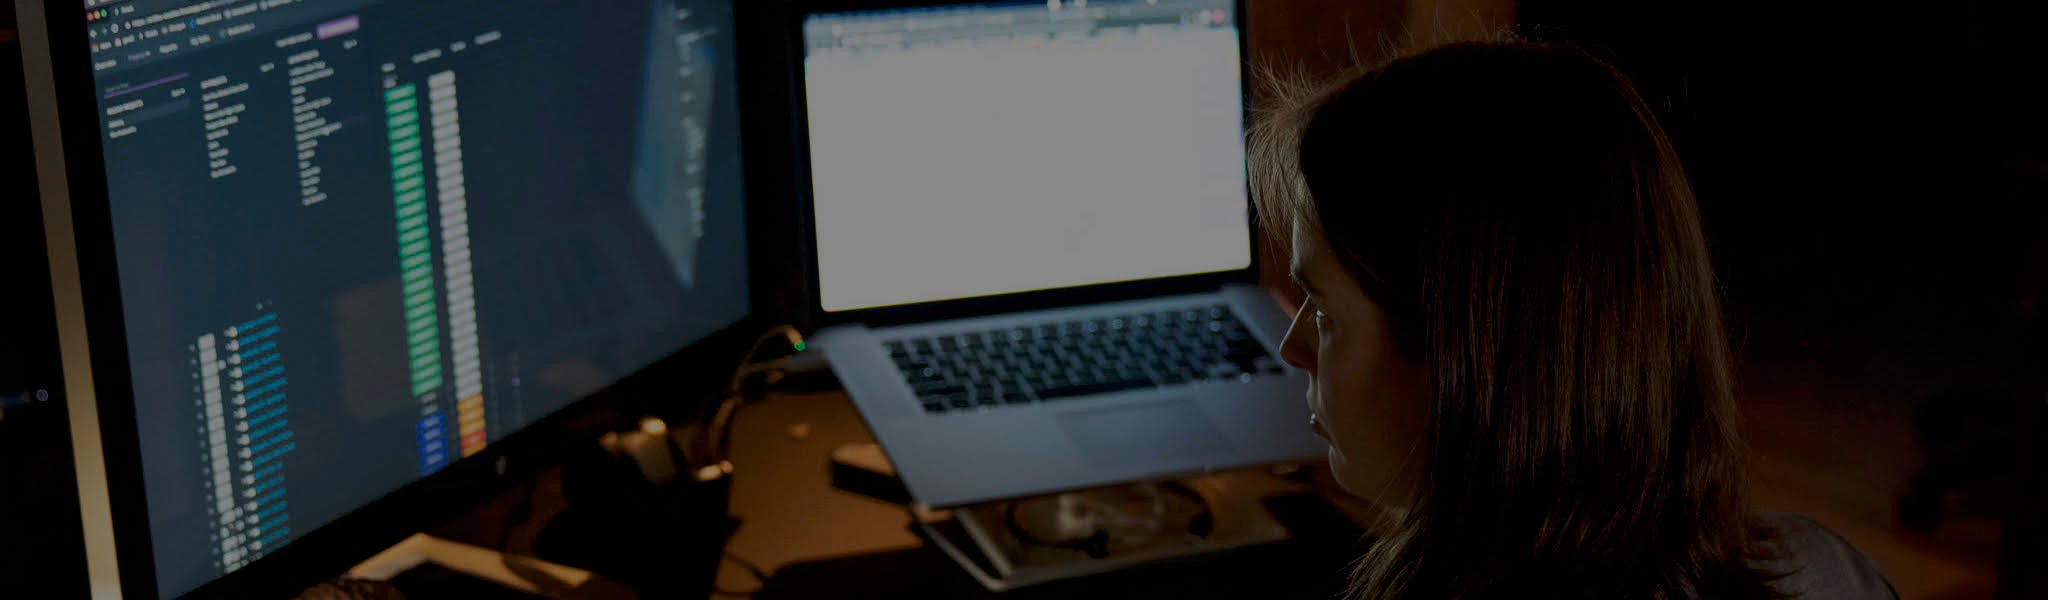 5 minutes with…Kimberley Walker, VFX Coordinator at Artifex